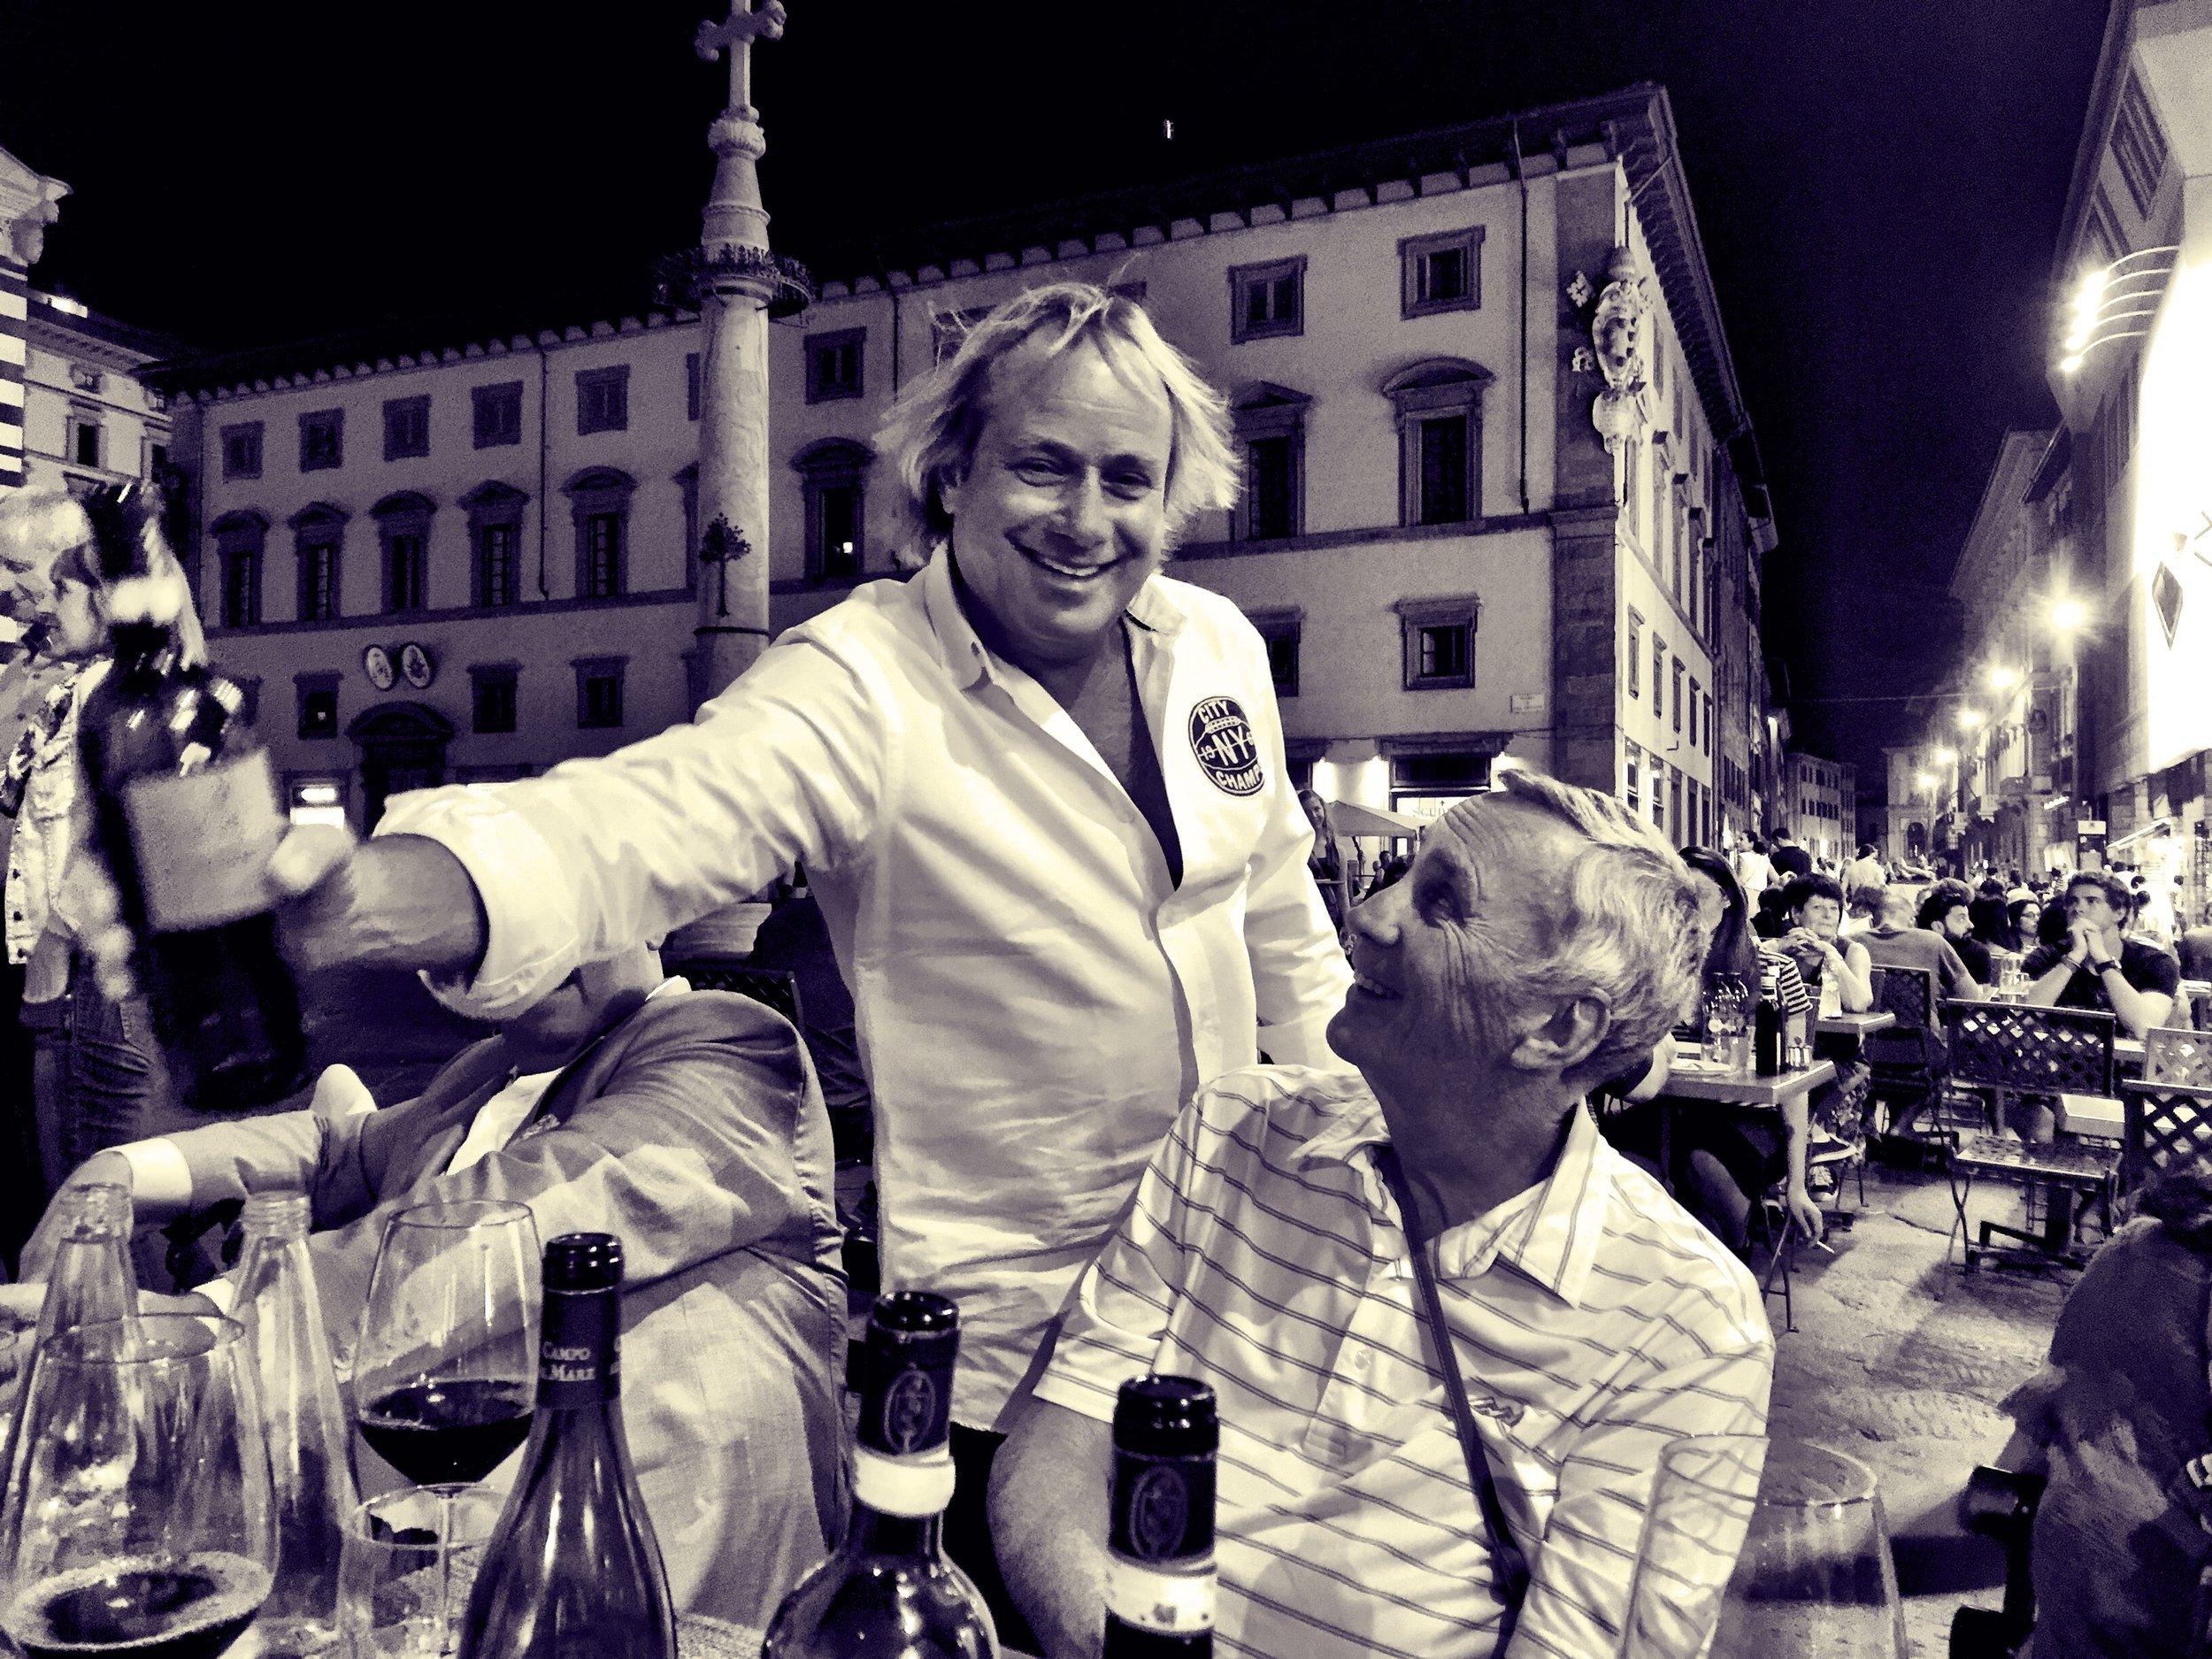 Walter Spitz serving the vino in Firenze